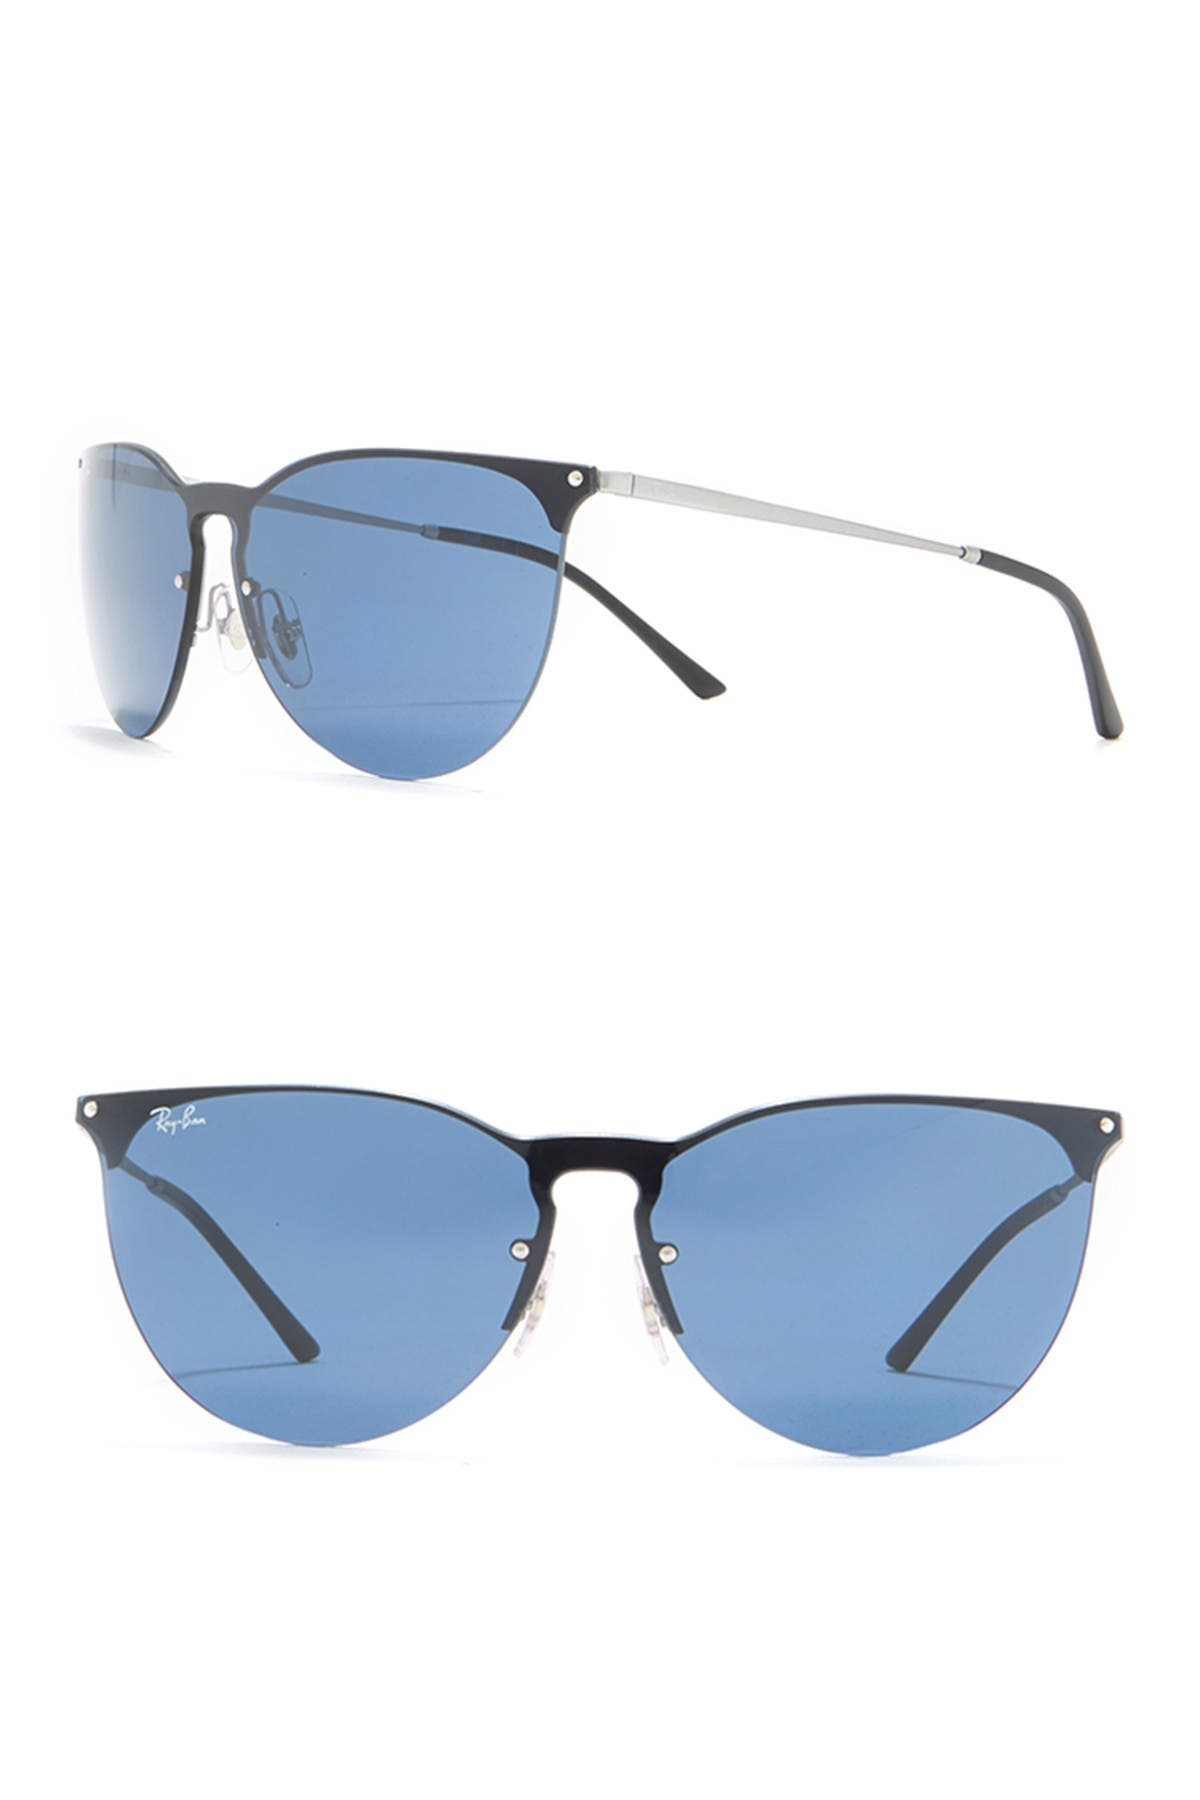 Image of Ray-Ban 41mm Phantos Rubber Aviator Sunglasses